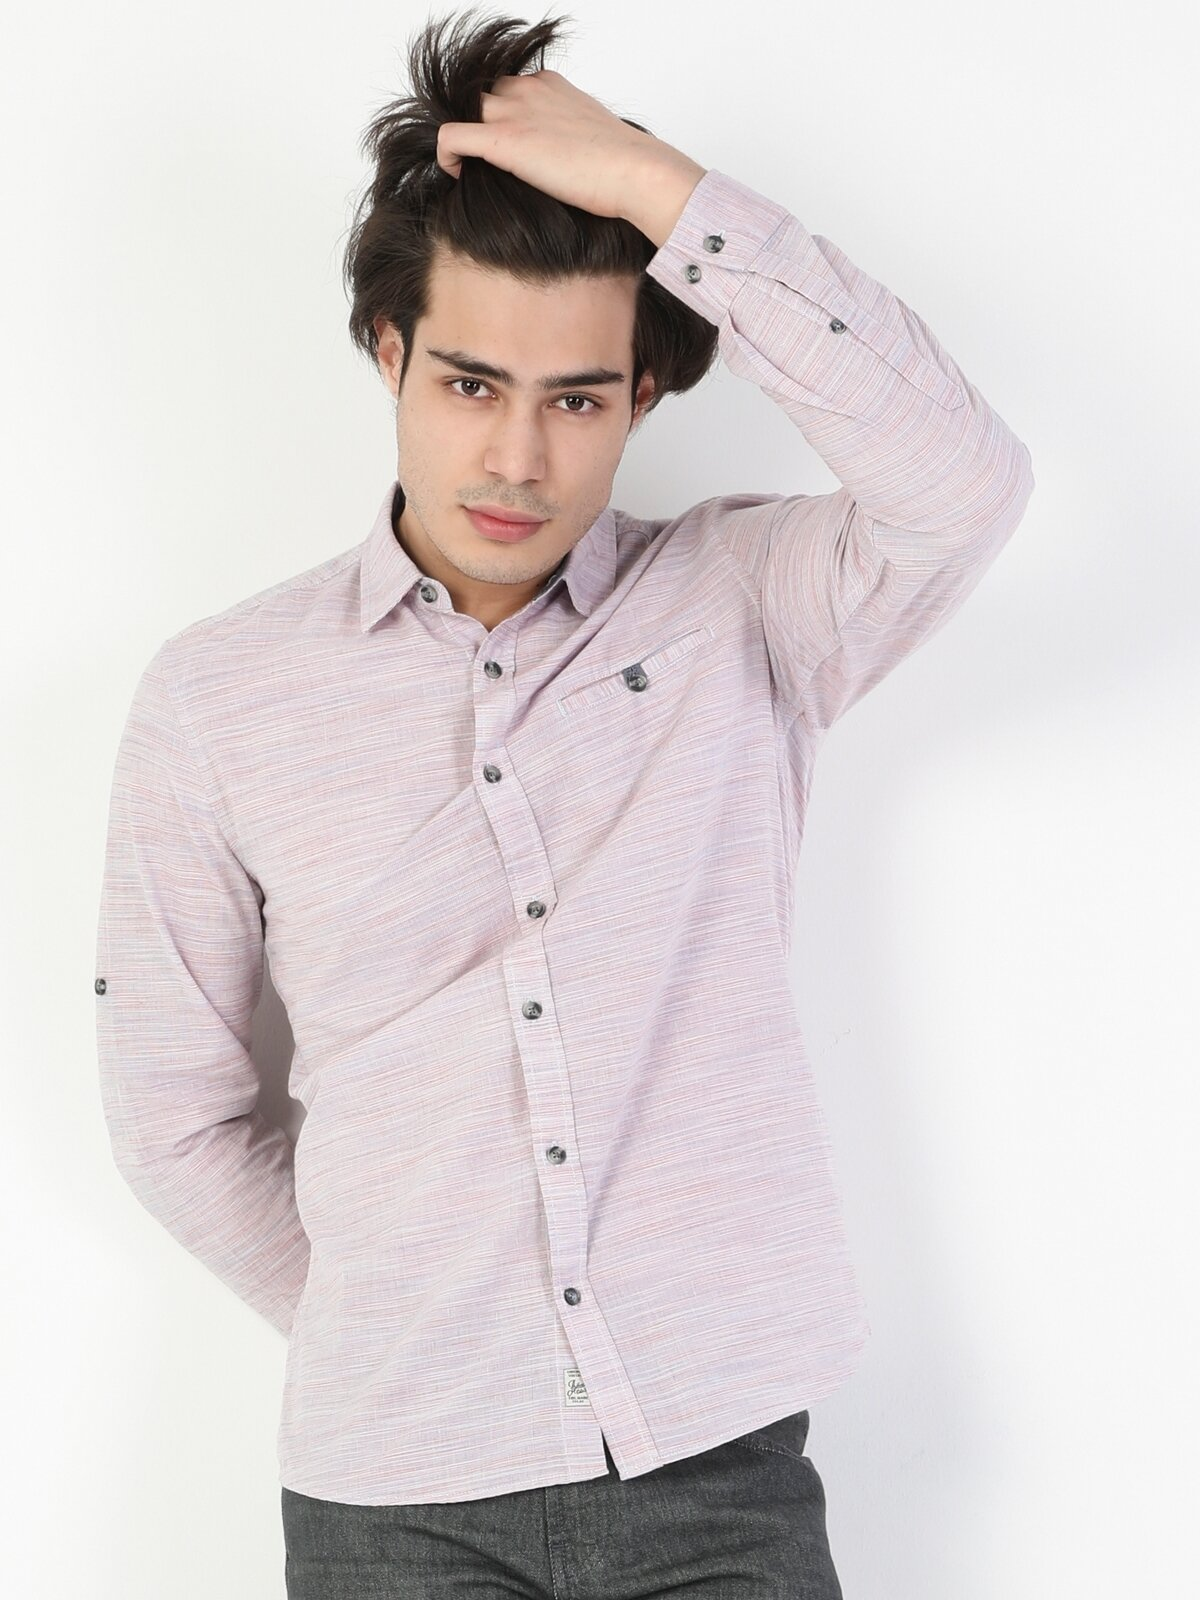 Slim Fit Shirt Neck Erkek Açık Mercan Uzun Kol Gömlek